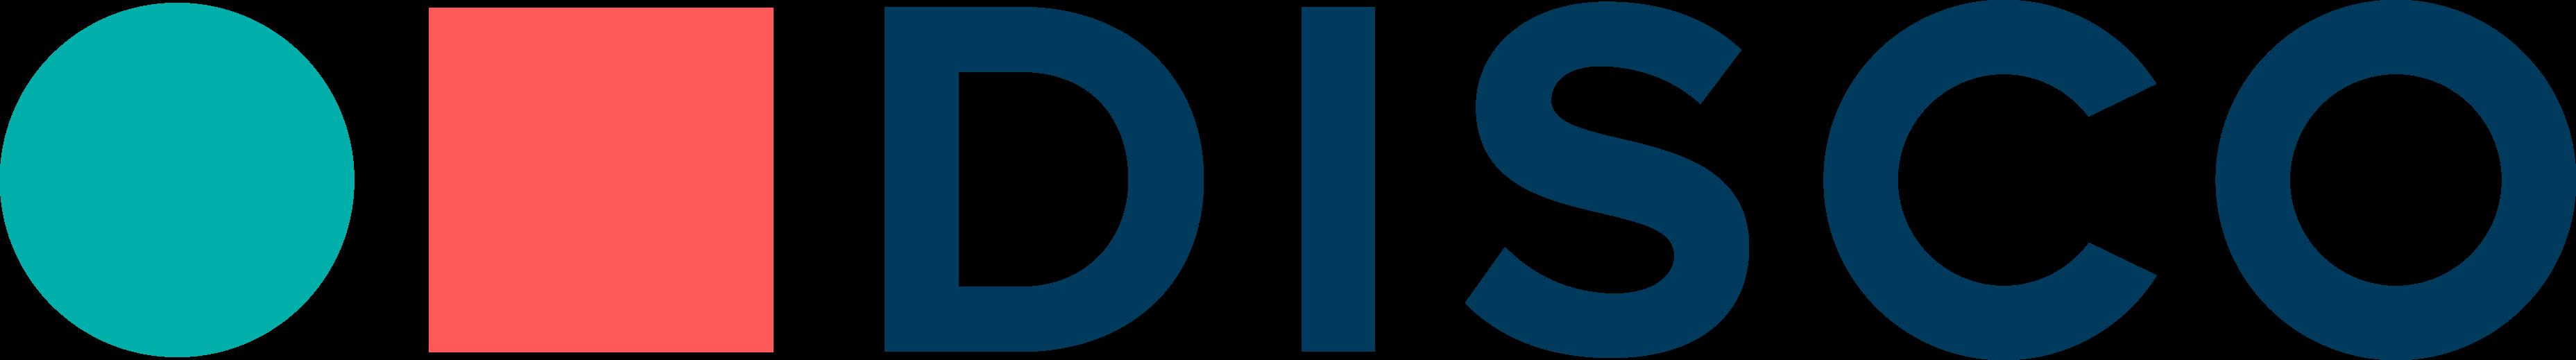 DISCO Ediscovery logo